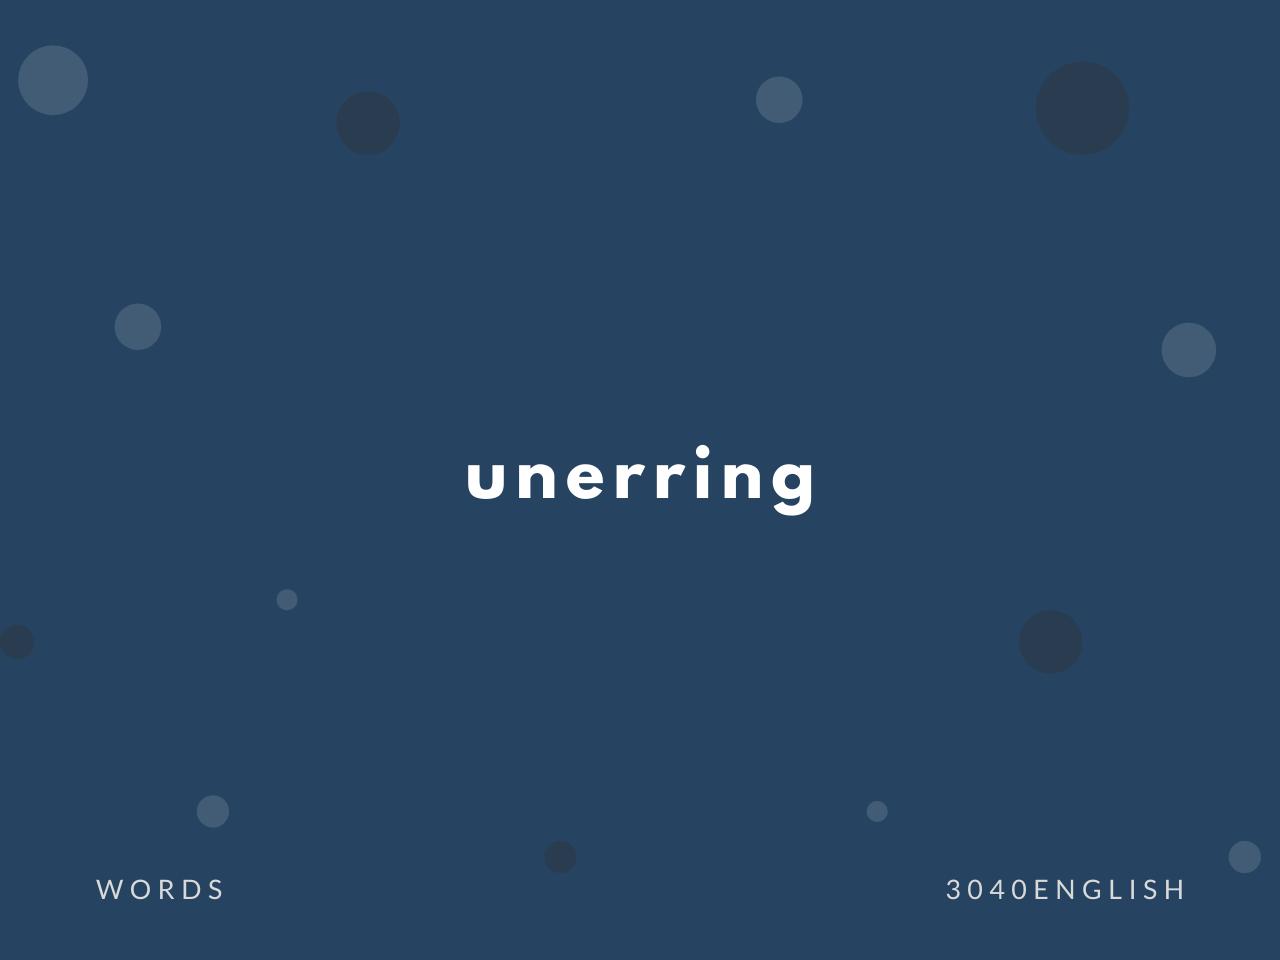 unerring の意味と簡単な使い方【音読用例文あり】